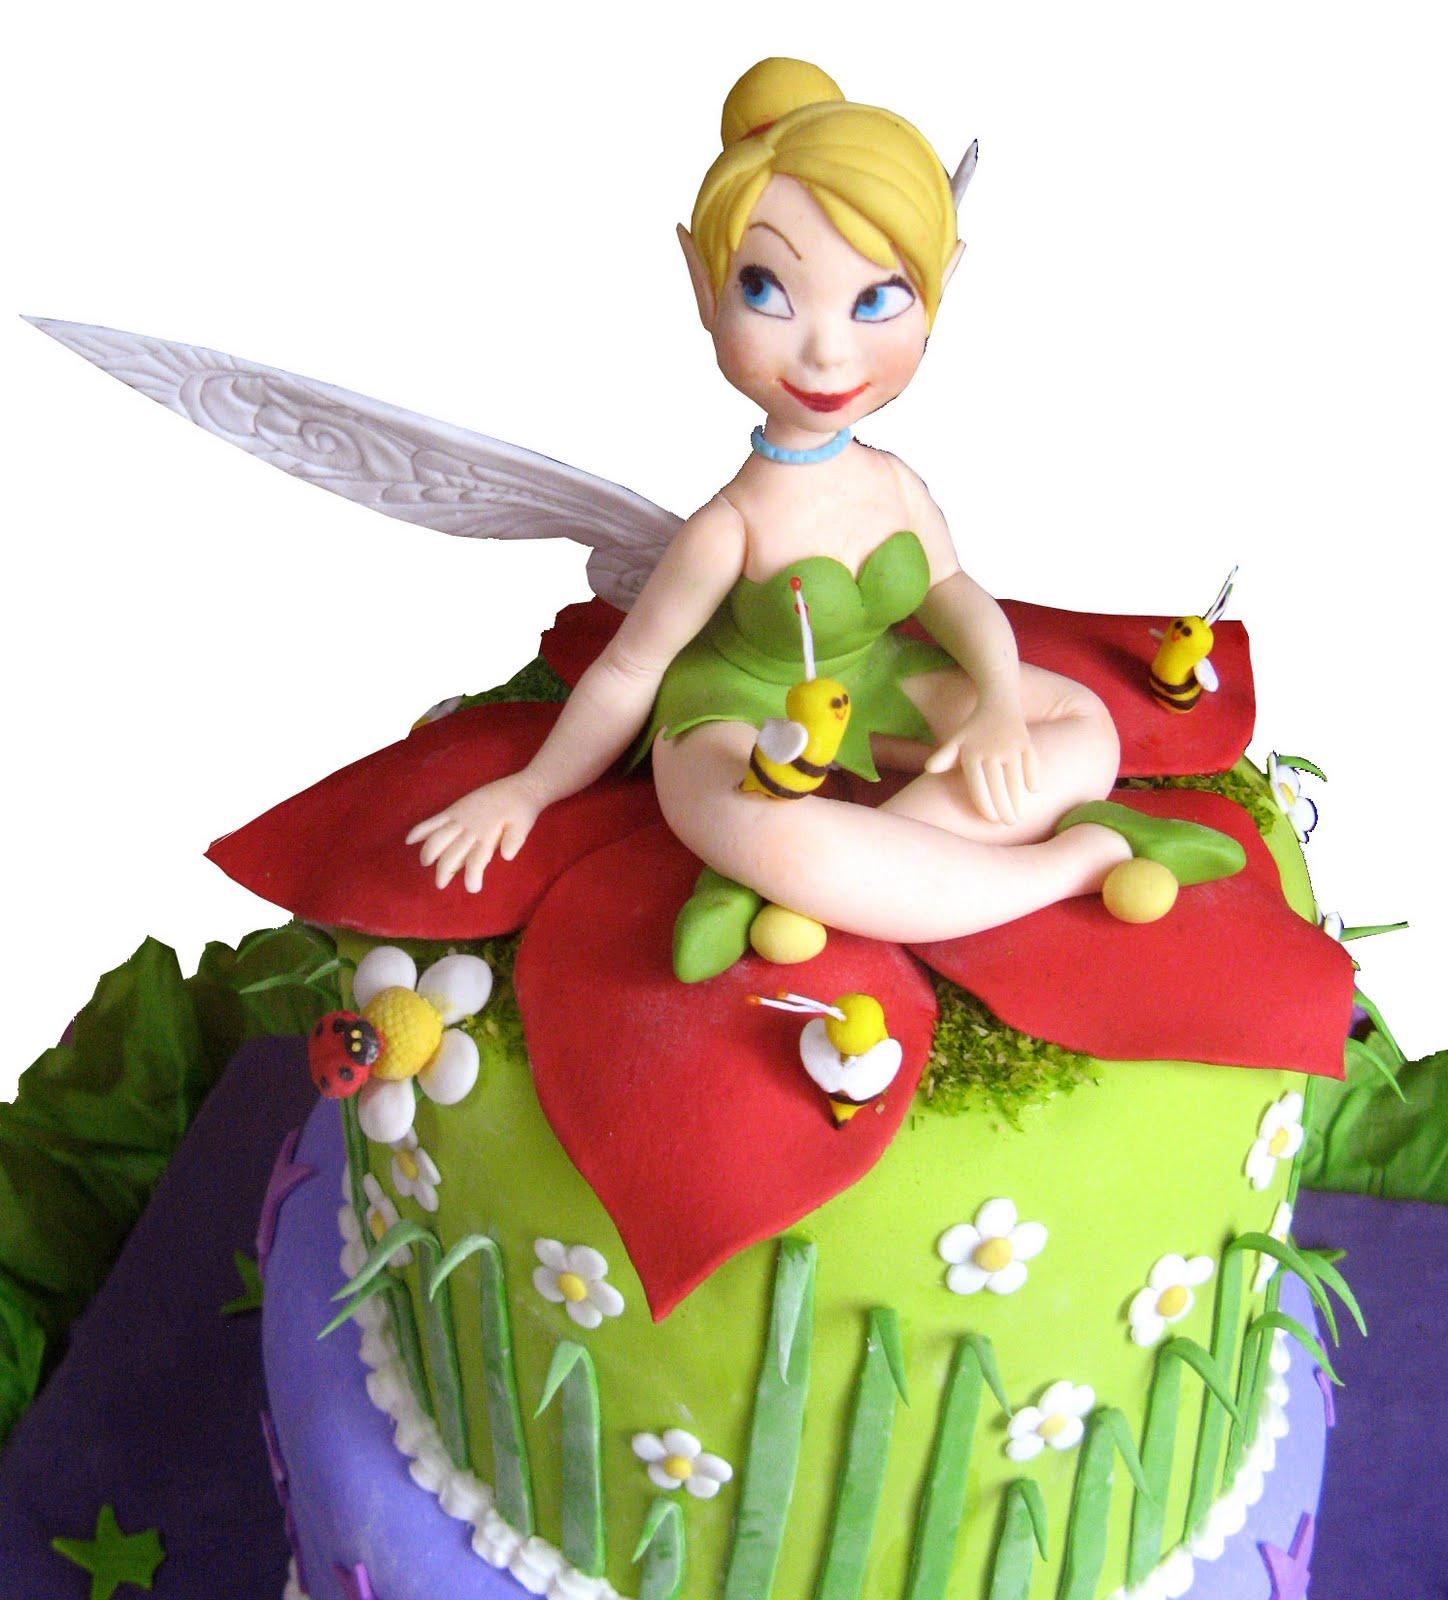 TORTA INFANTILES MARÍA ELENA: Detalle de Torta de Tinker Bell